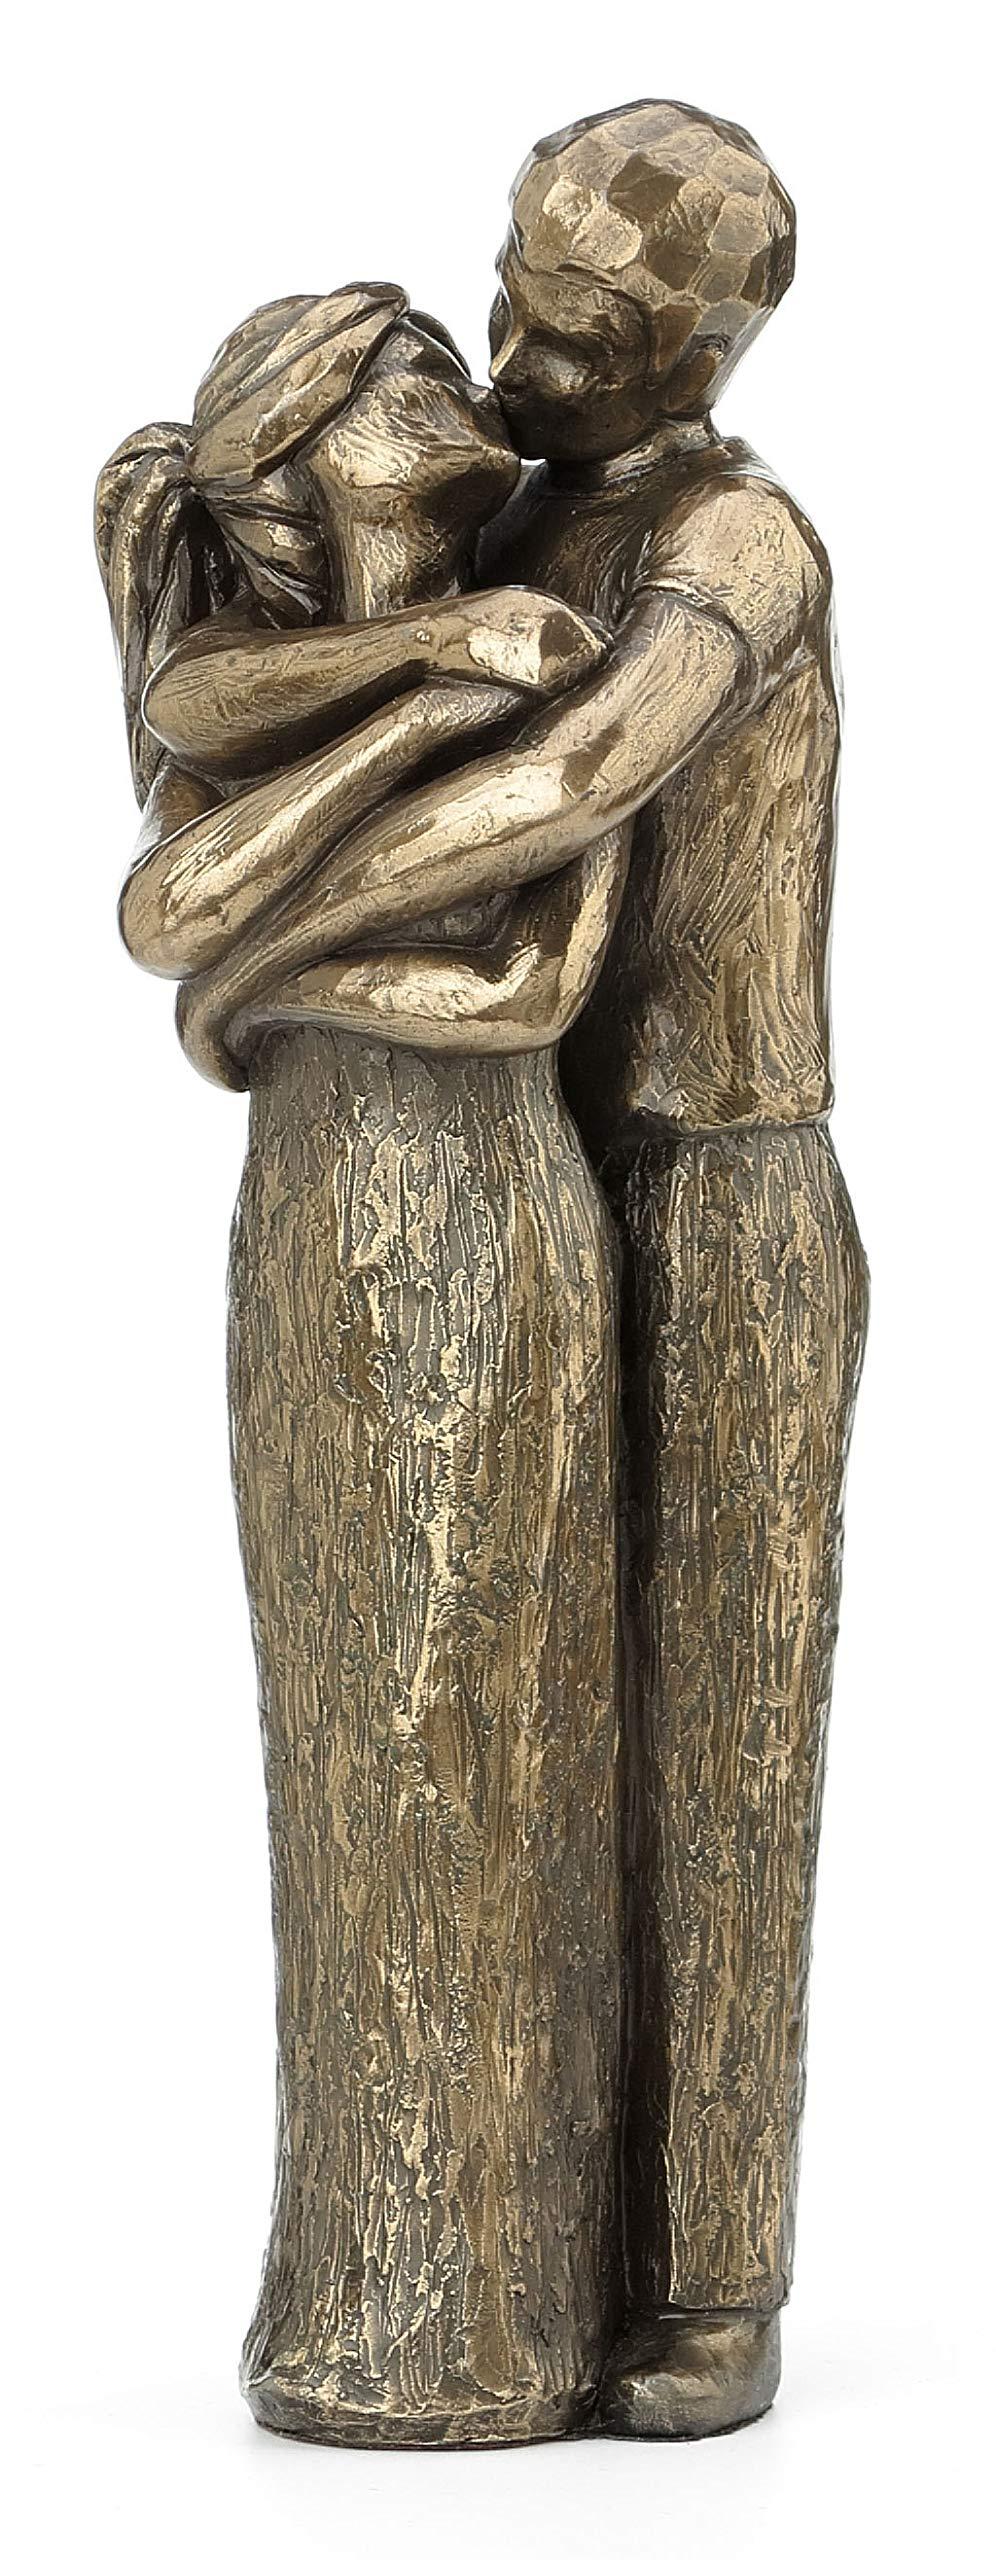 JFSM INC. Soulmates Lovers Kissing Sculpture - Perfect Wedding by JFSM INC.